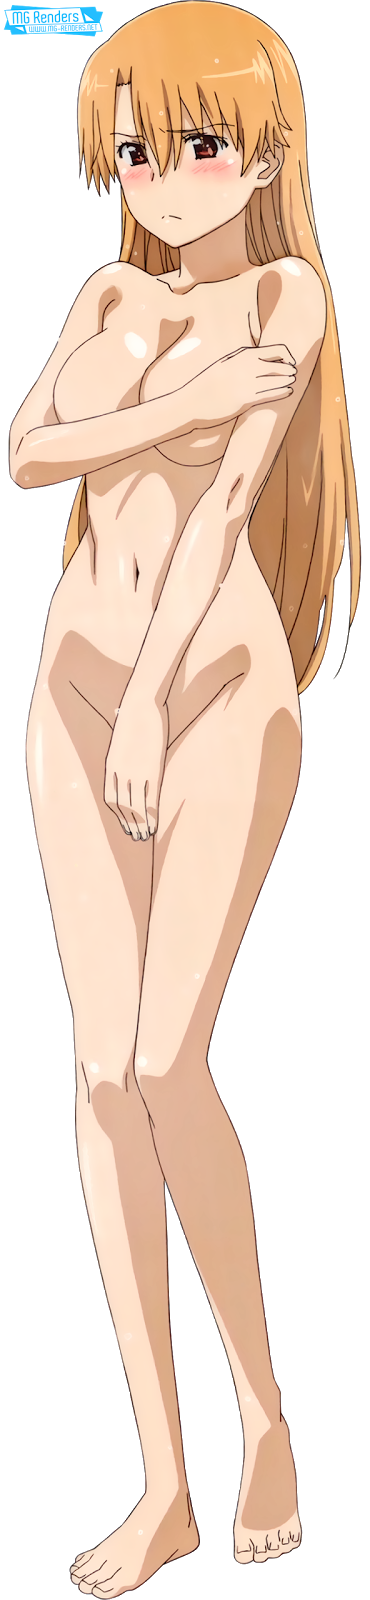 Tags: Anime, Render,  Bare legs,  Feet,  Kiryuu Yuuzuki,  Kiss X Sis,  No bra, PNG, Image, Picture